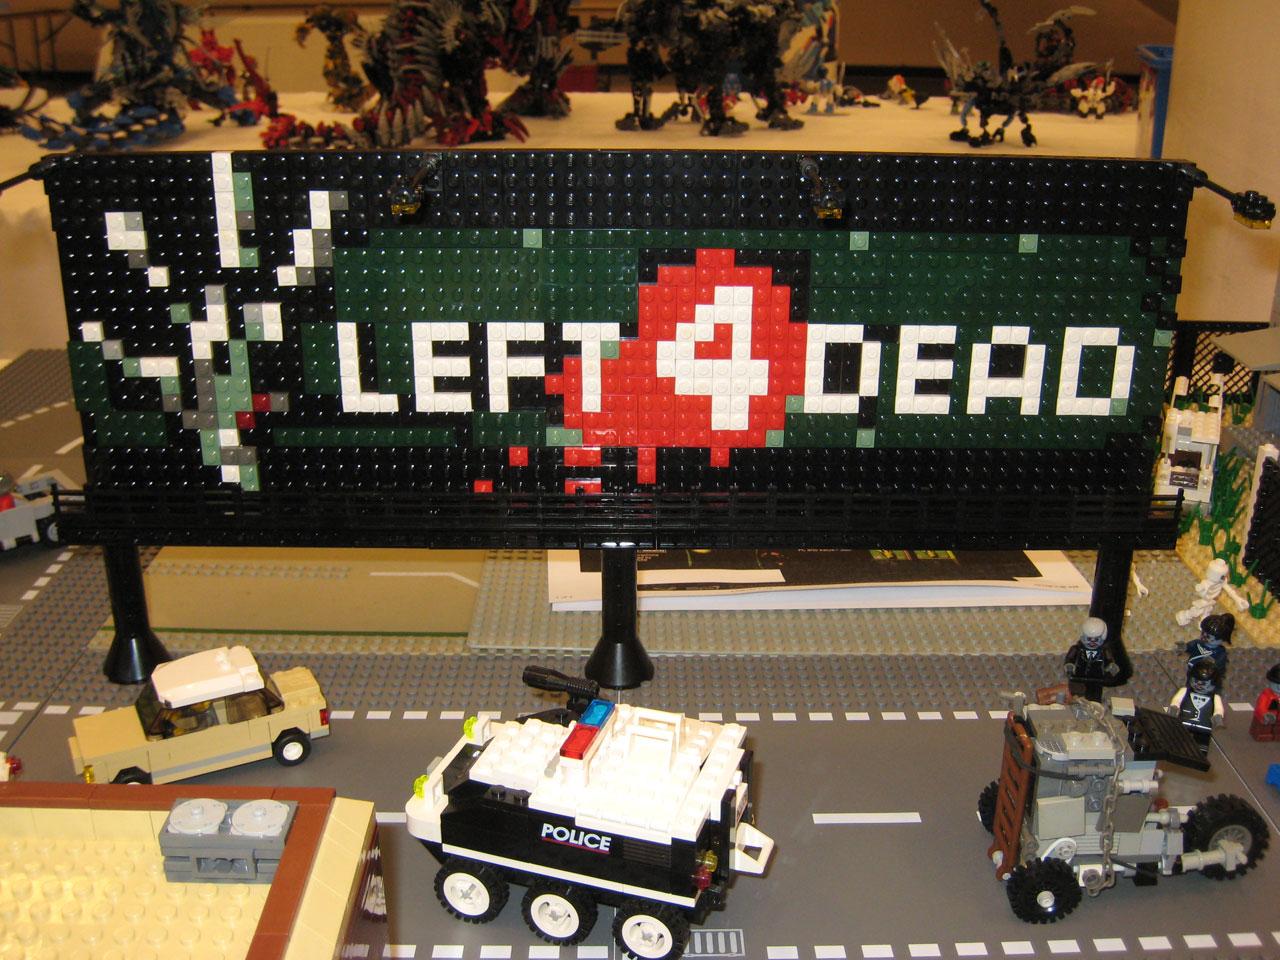 https://www.l4d.com/blog/images/posts/002/Lego01.jpg